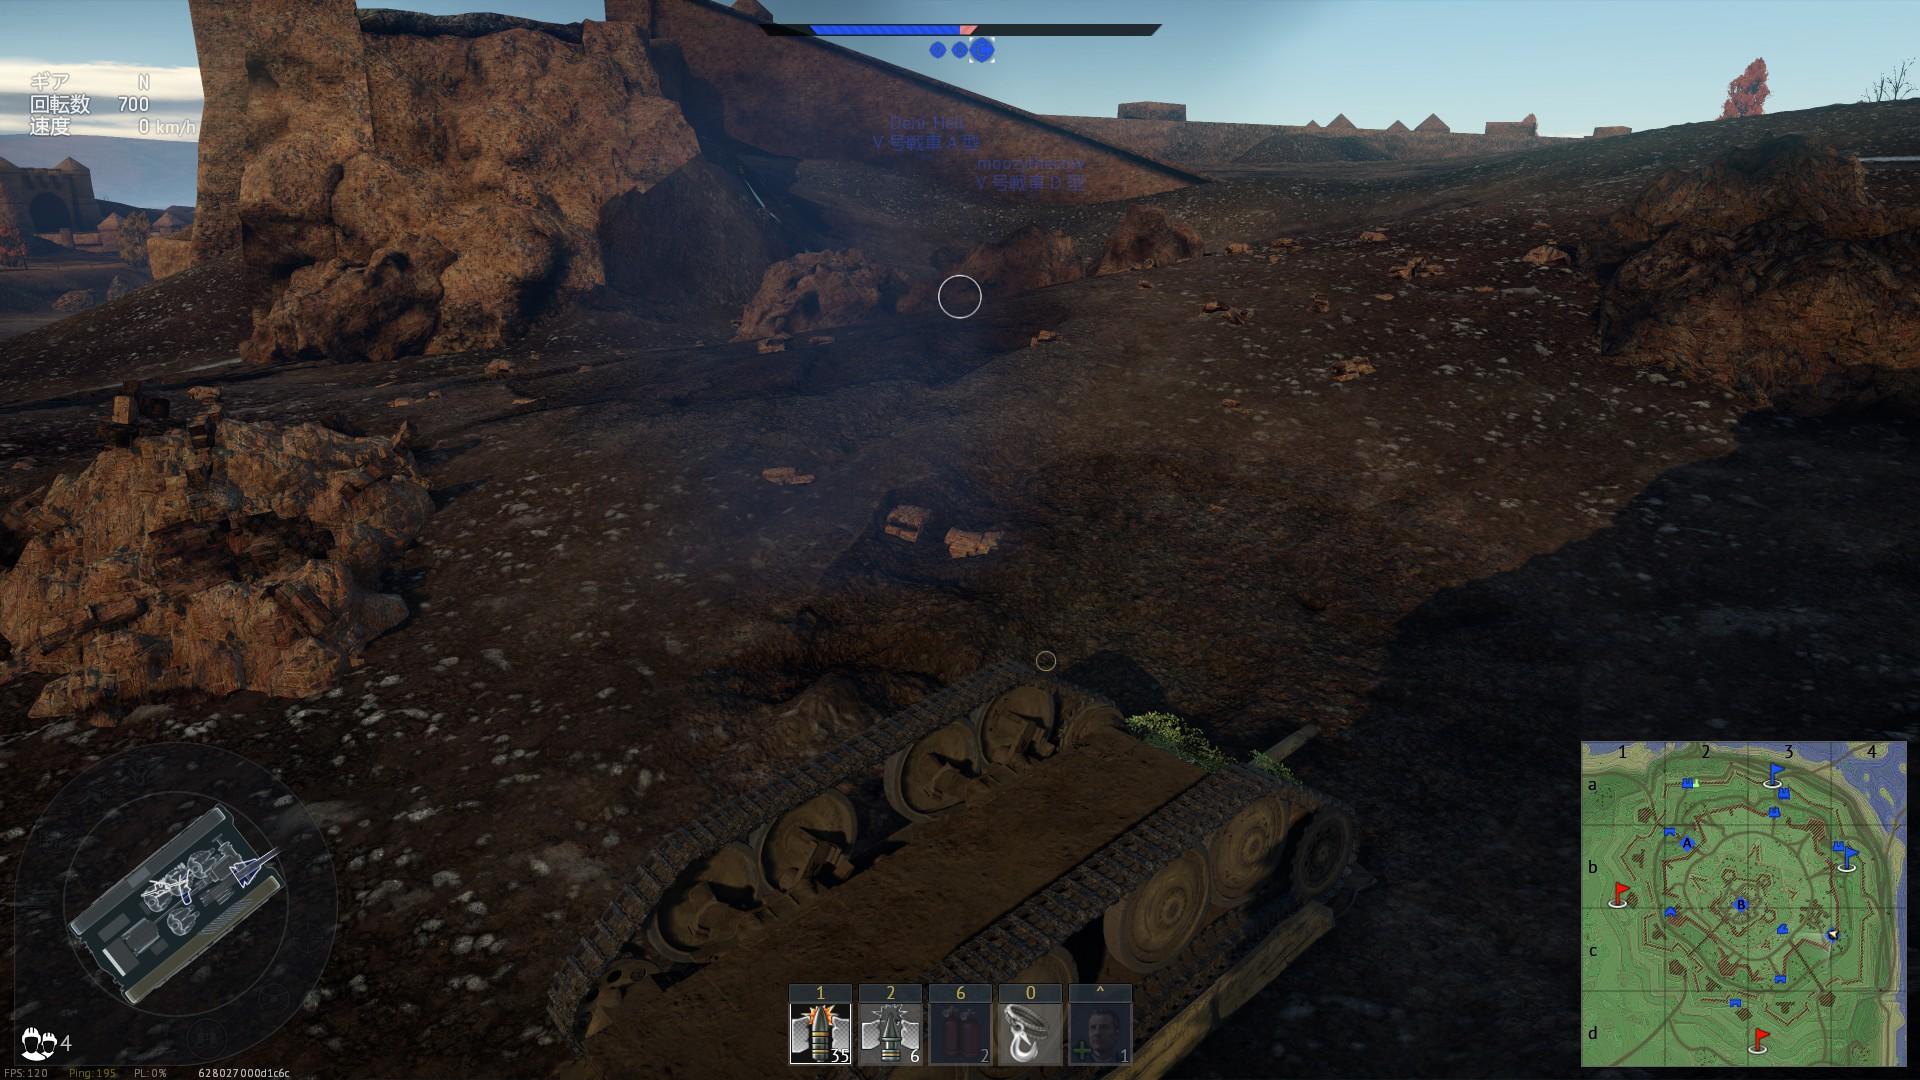 Guerra Thunder matchmaking Arcade